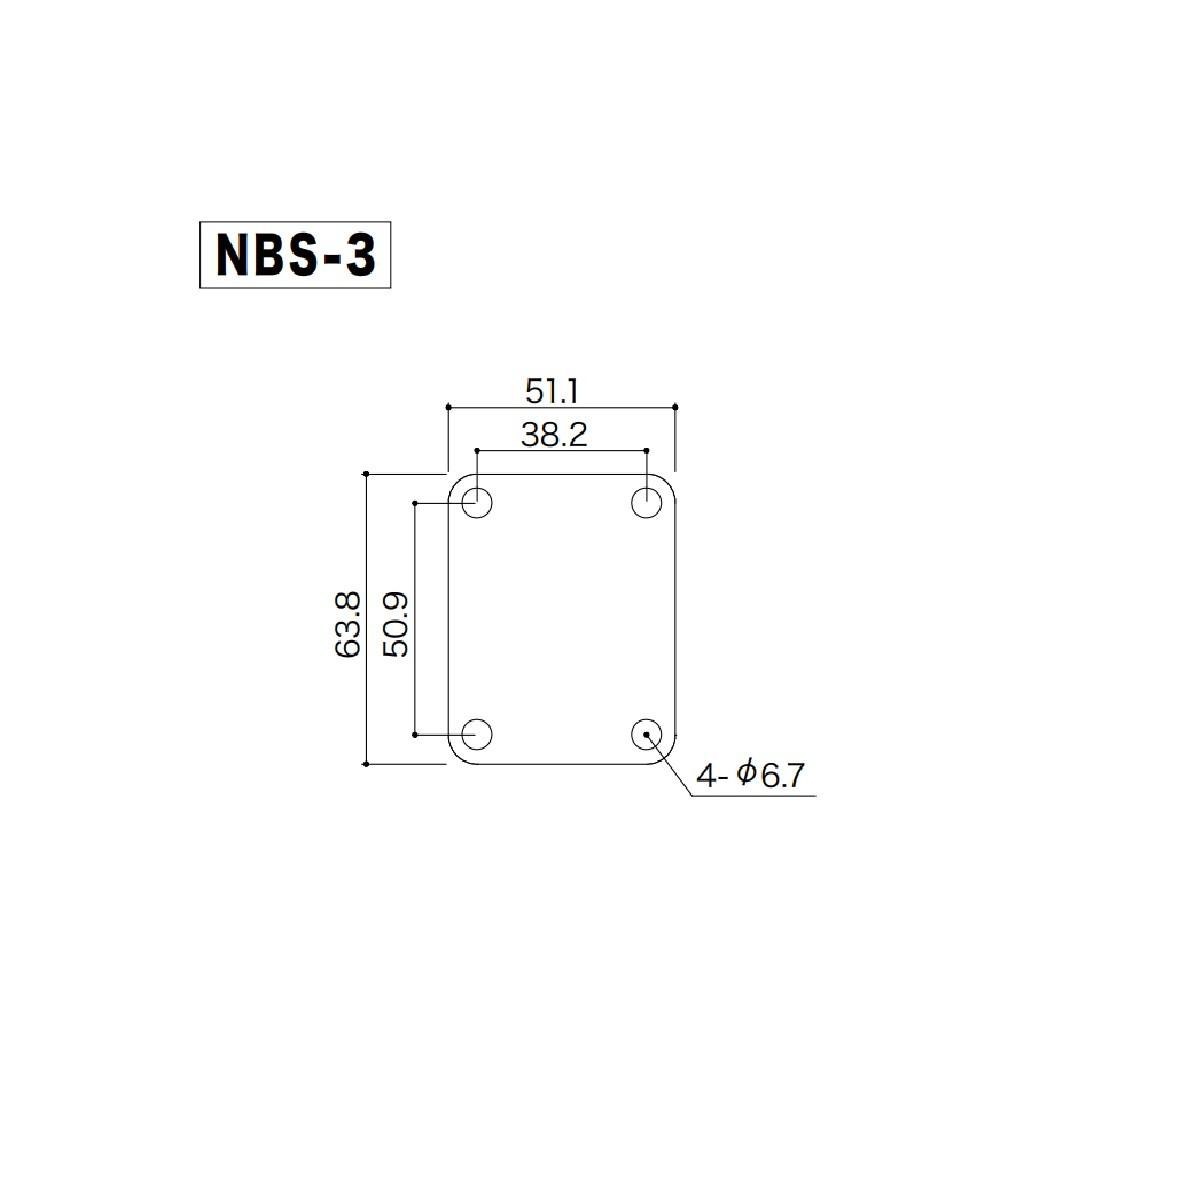 NECK PLATE PARA GUITARRA C/ PARAFUSOS CROMADO NBS-3 - GOTOH